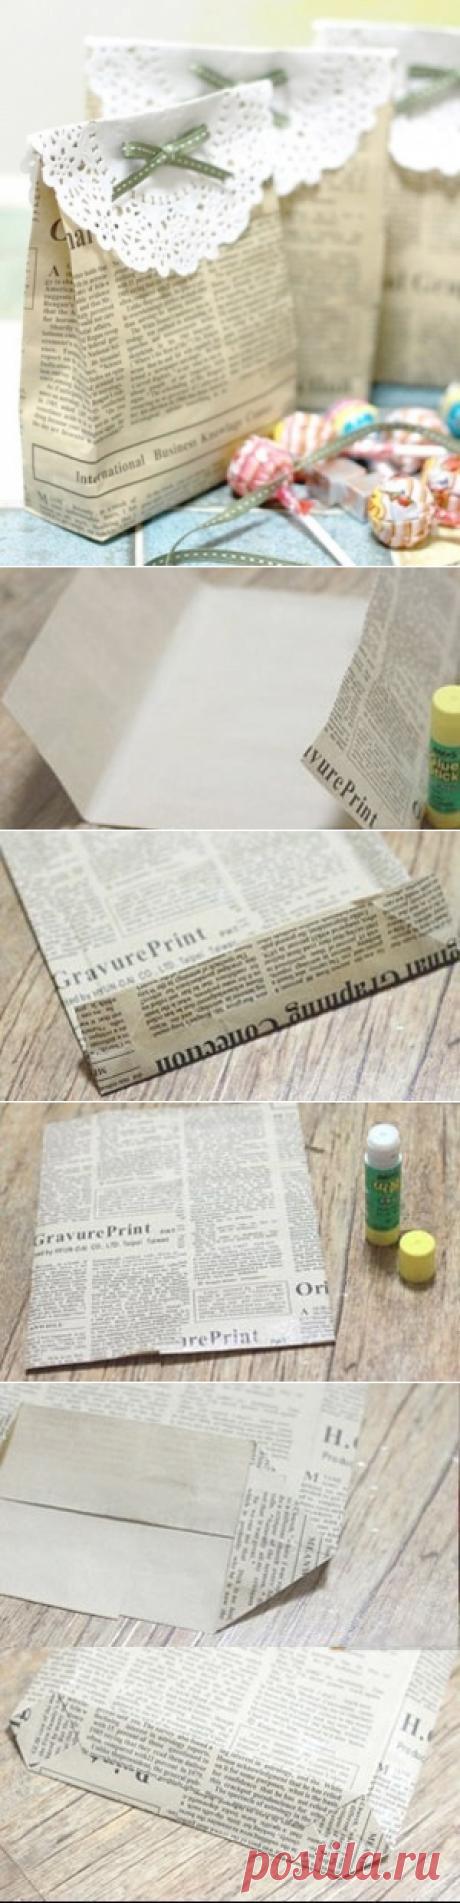 Пакет из газеты